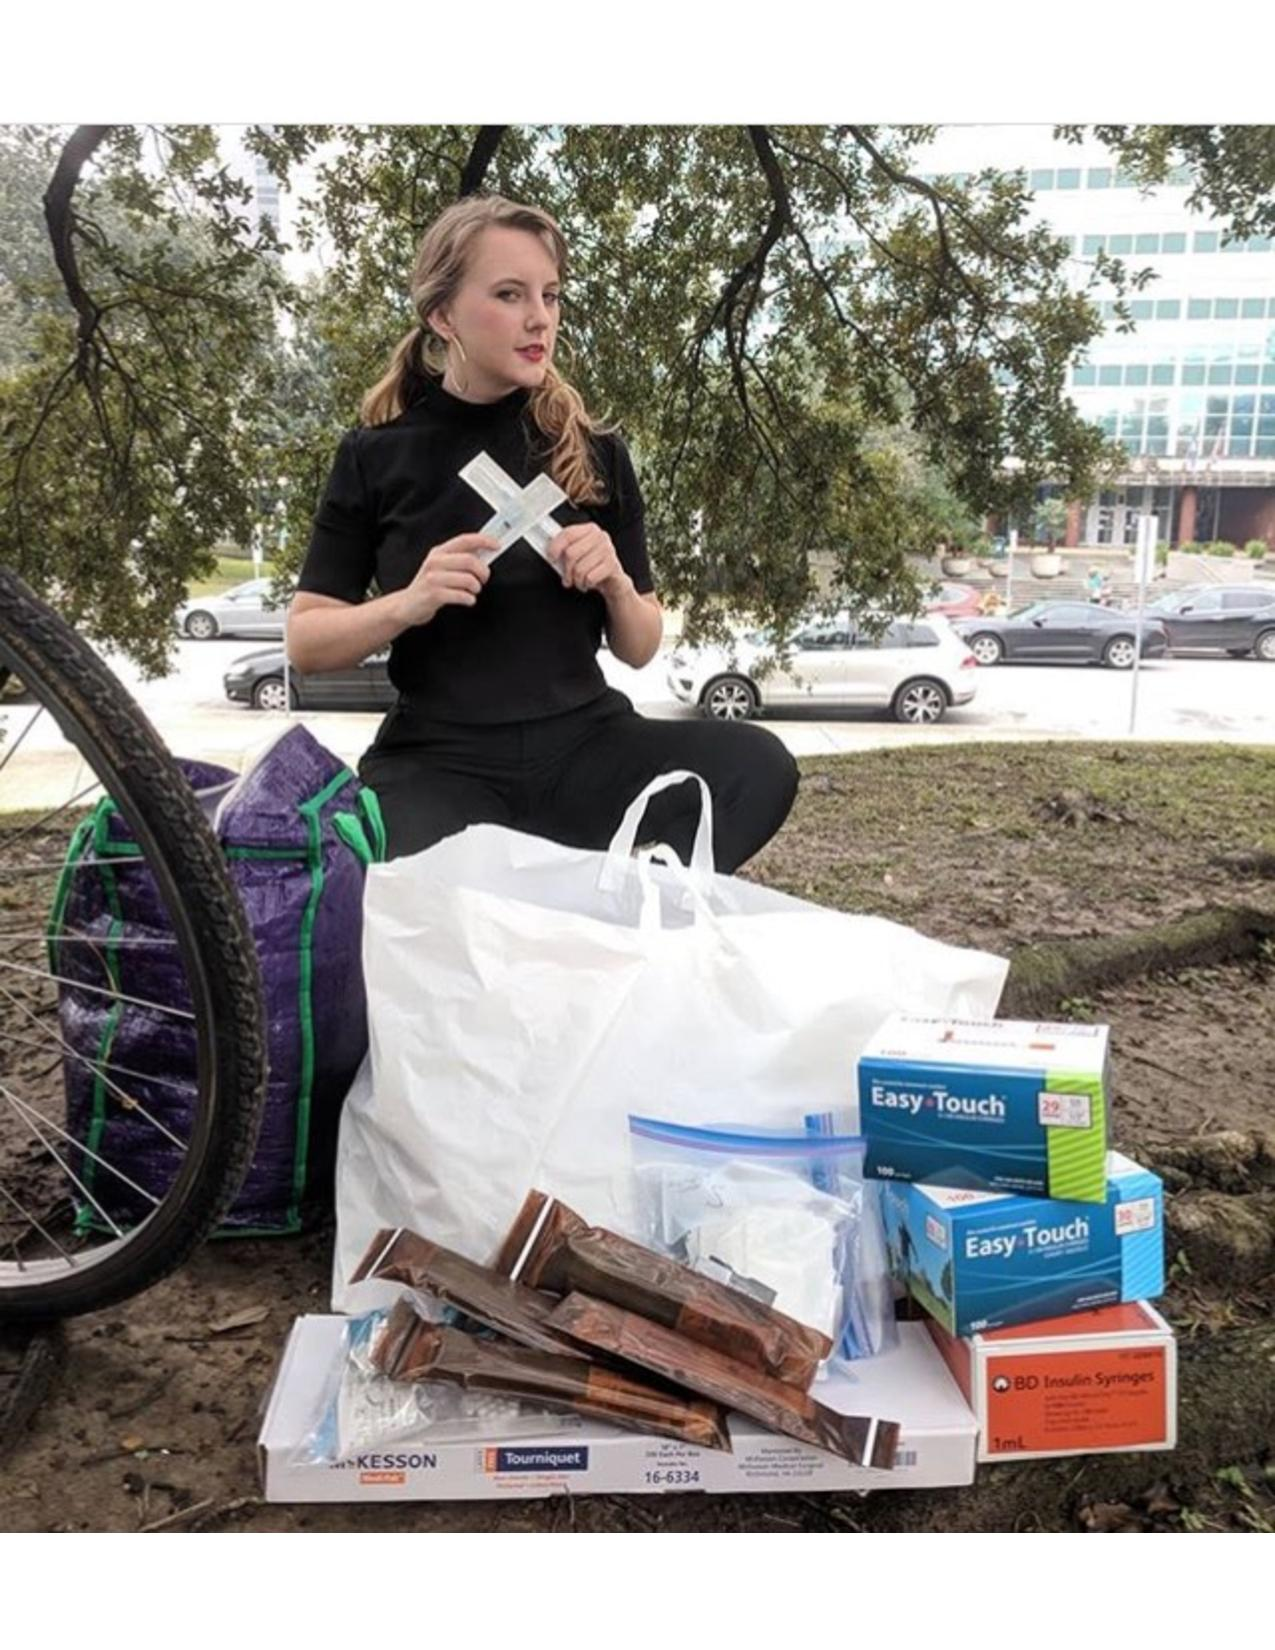 Supplies by Bike - Duncan Plaza, 2018